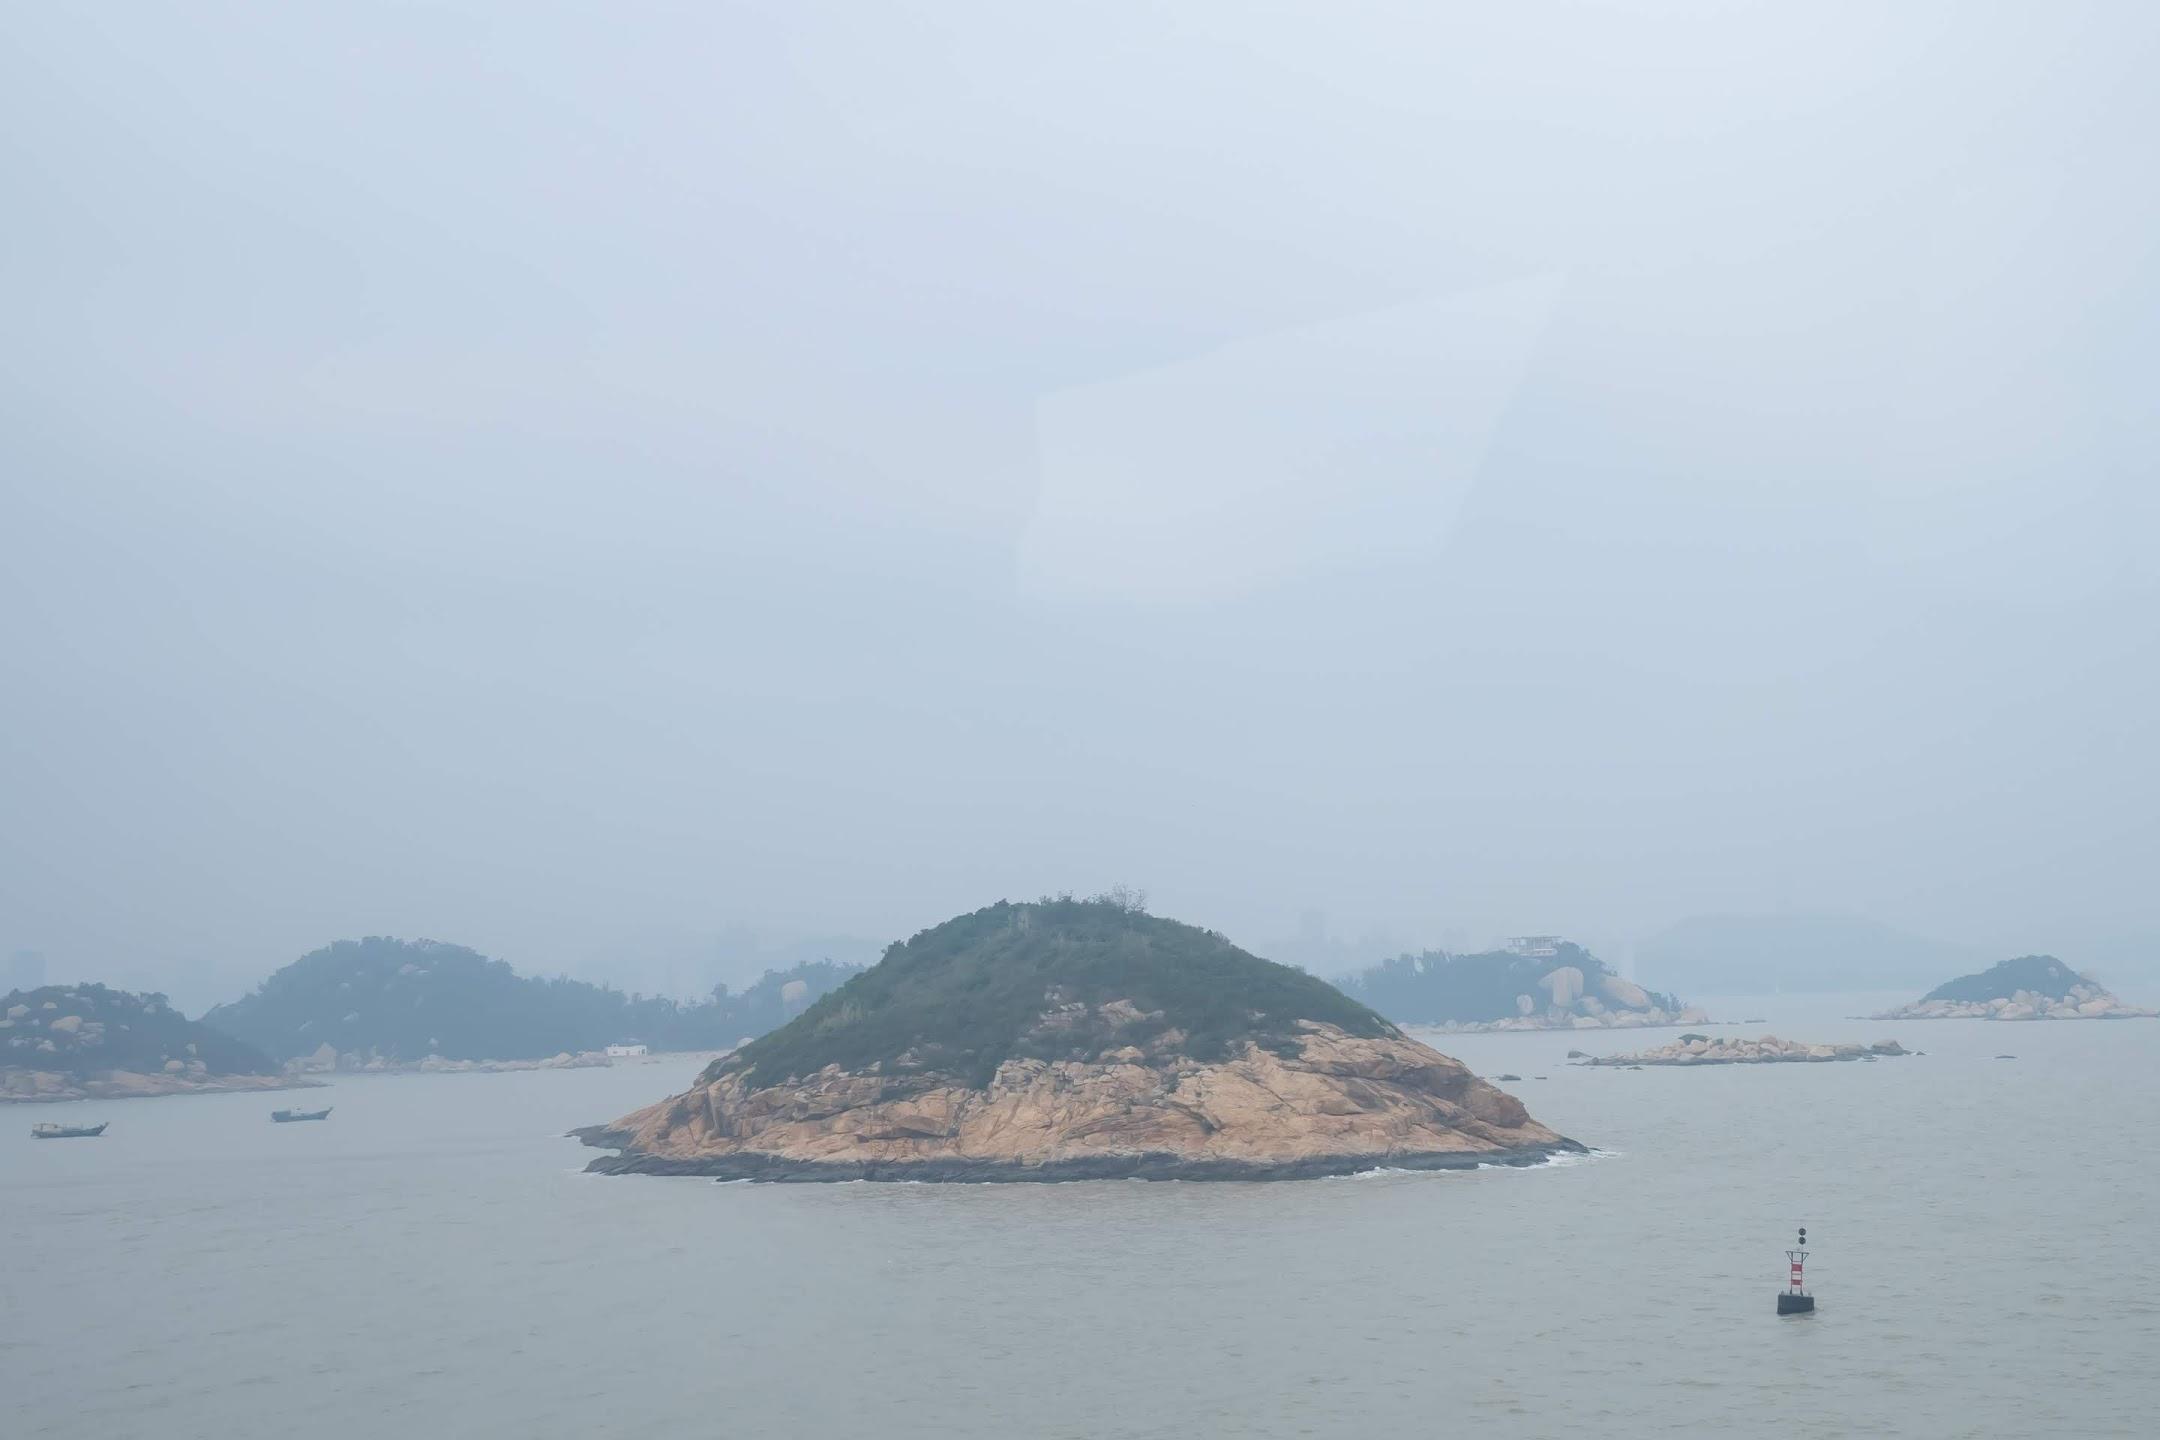 Hong Kong-Zhuhai-Macao Bridge3